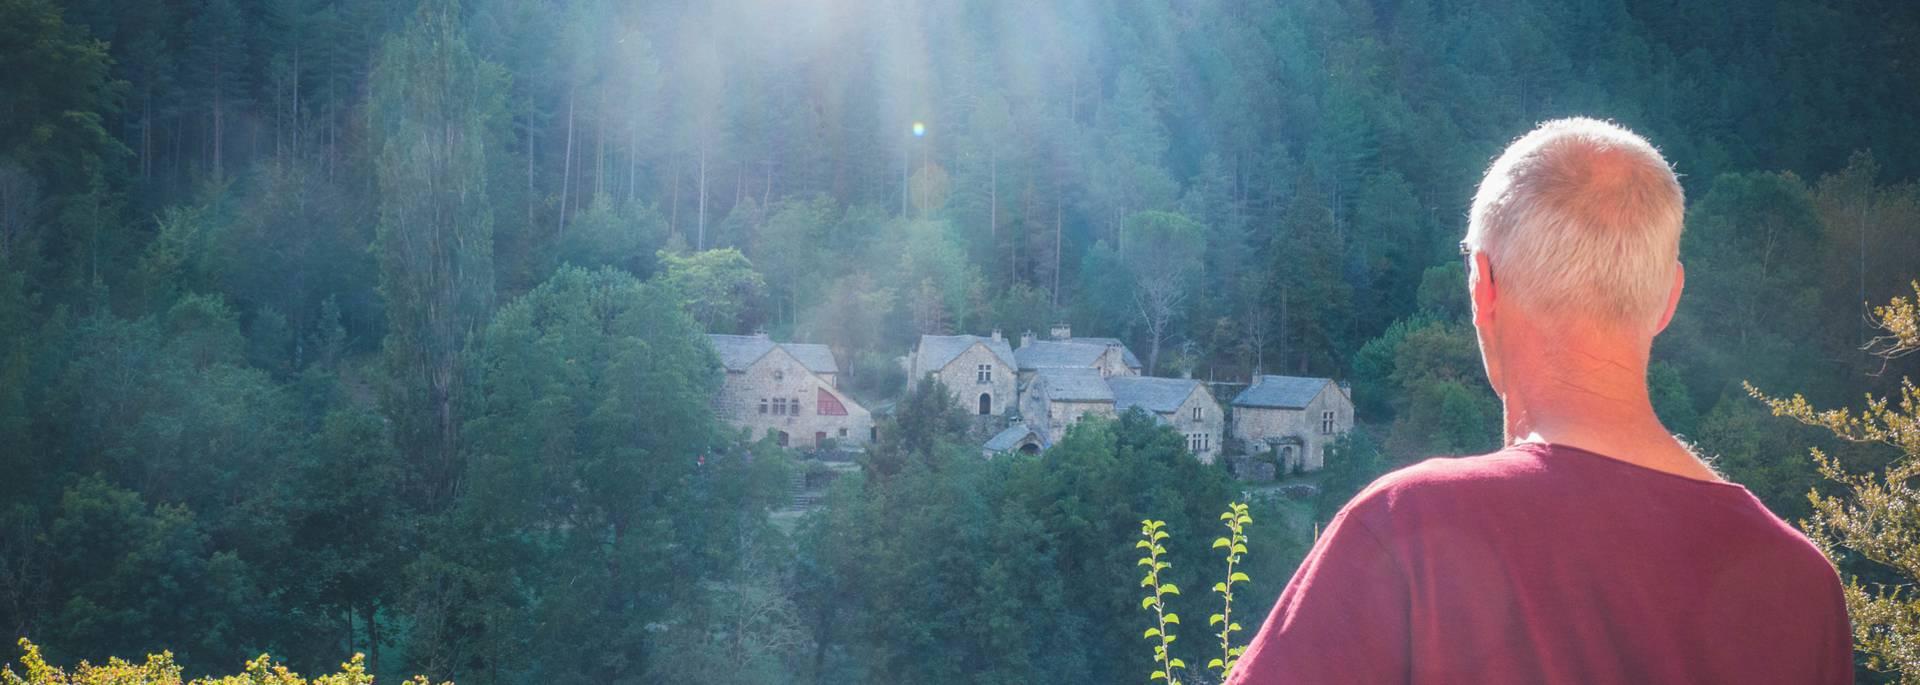 La Croze, Gorges du Tarn